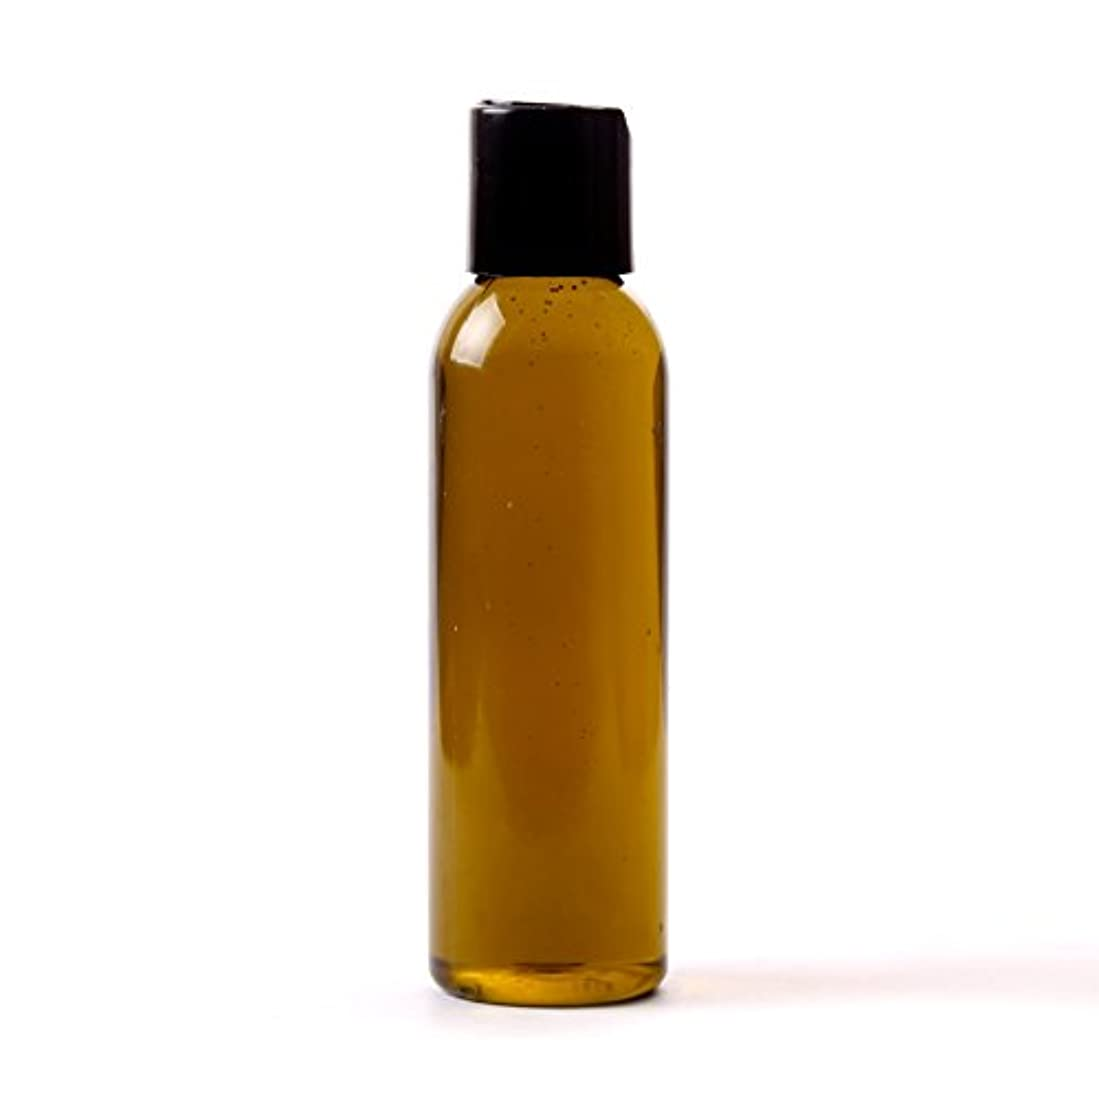 Mystic Moments | Broccoli Seed Virgin Oil - 125ml - 100% Pure